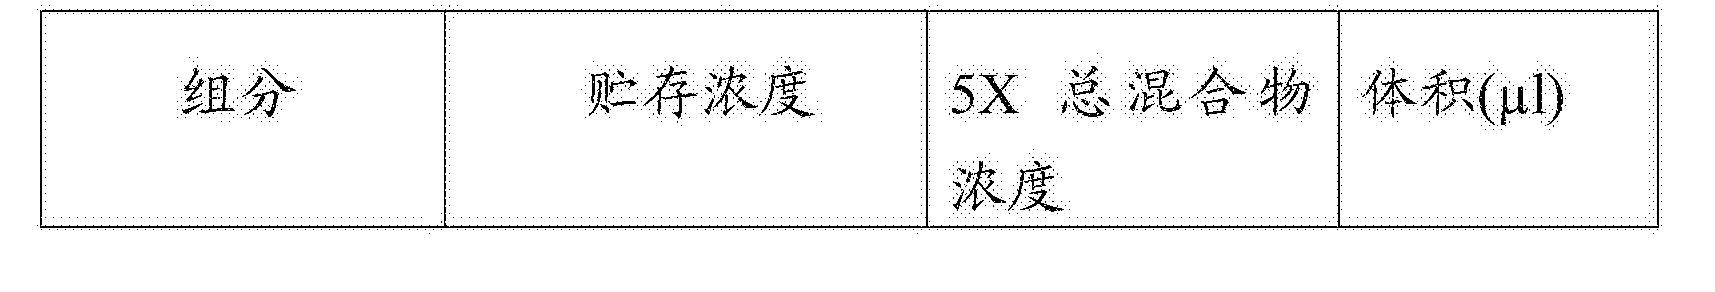 Figure CN106795651AD00303